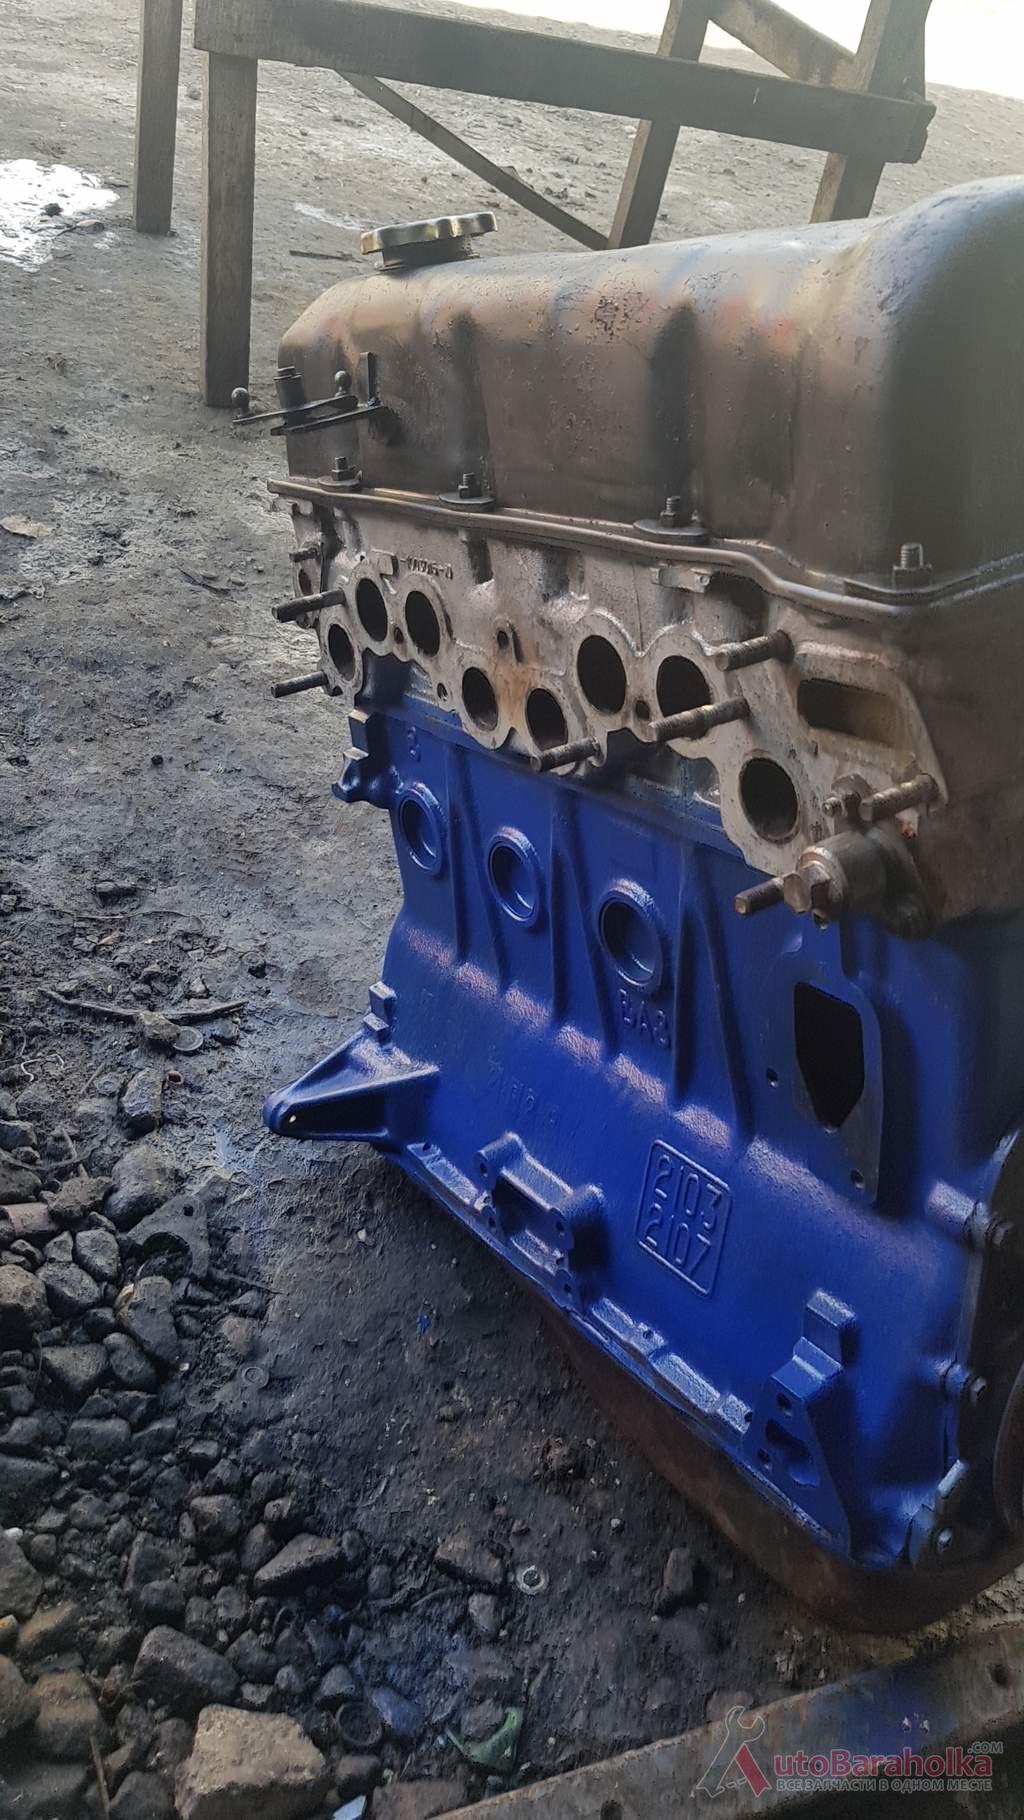 кап ремонт двигателя ваз 2101